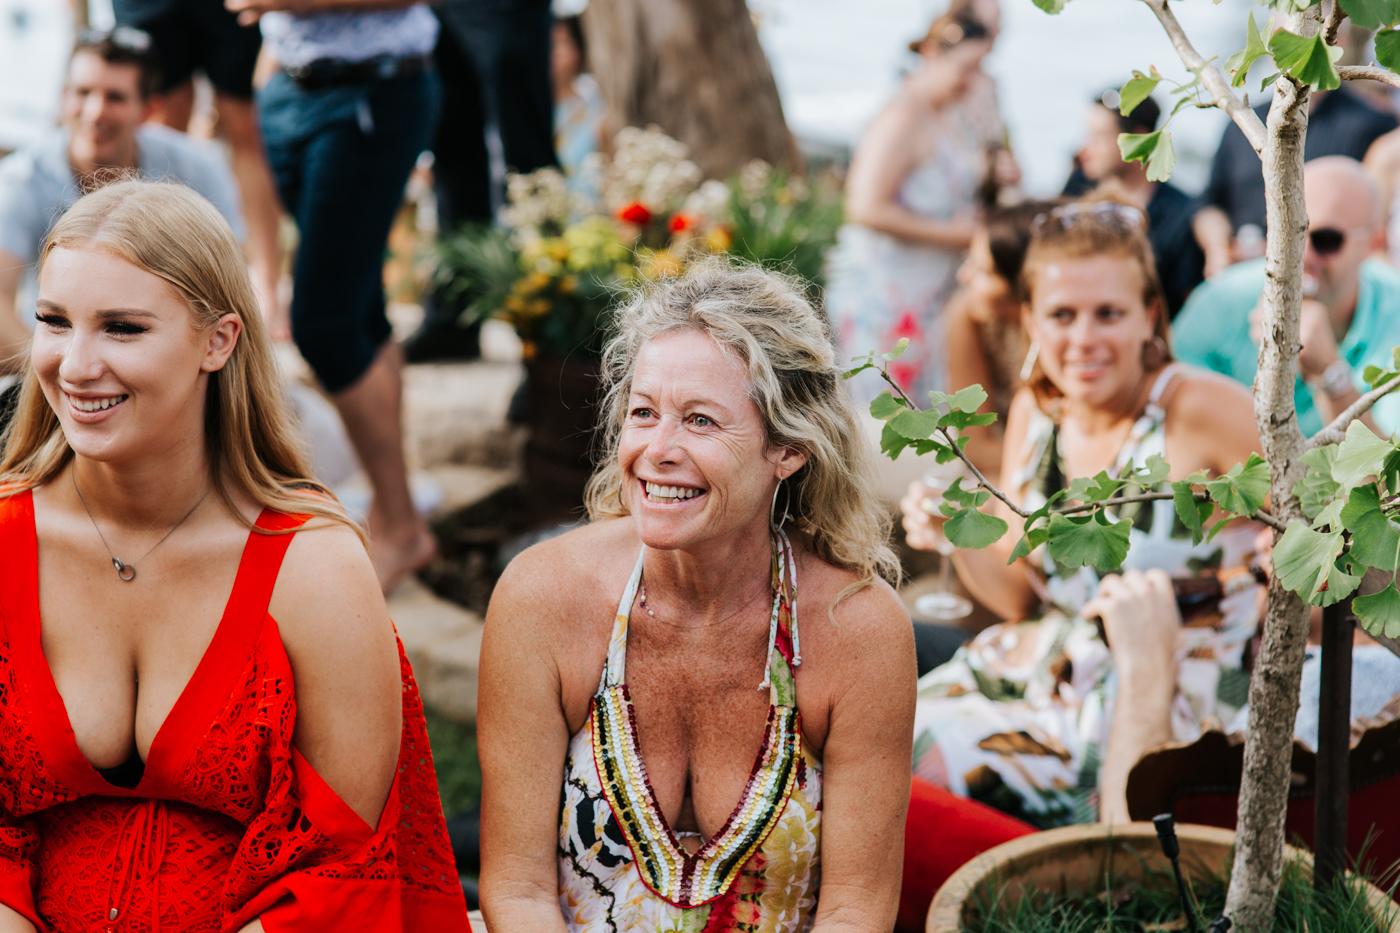 Emma & Ben - Lake Macquarie - Hunter Valley Wedding - Samantha Heather Photography-162.jpg